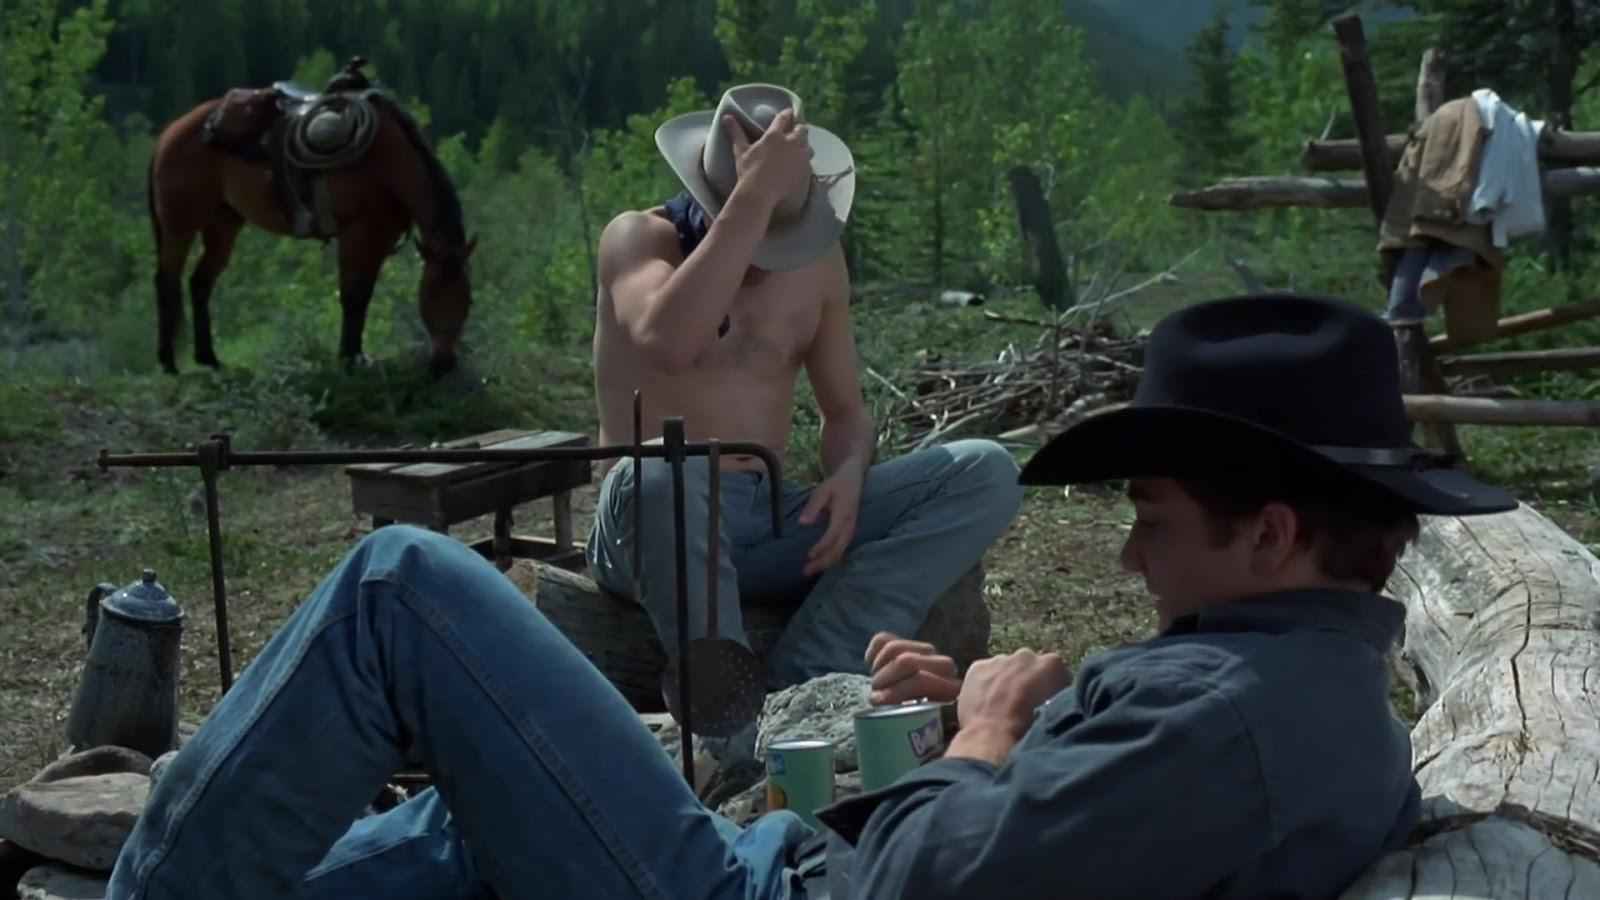 Brad pitt and leonardo dicaprio both turned down brokeback mountain